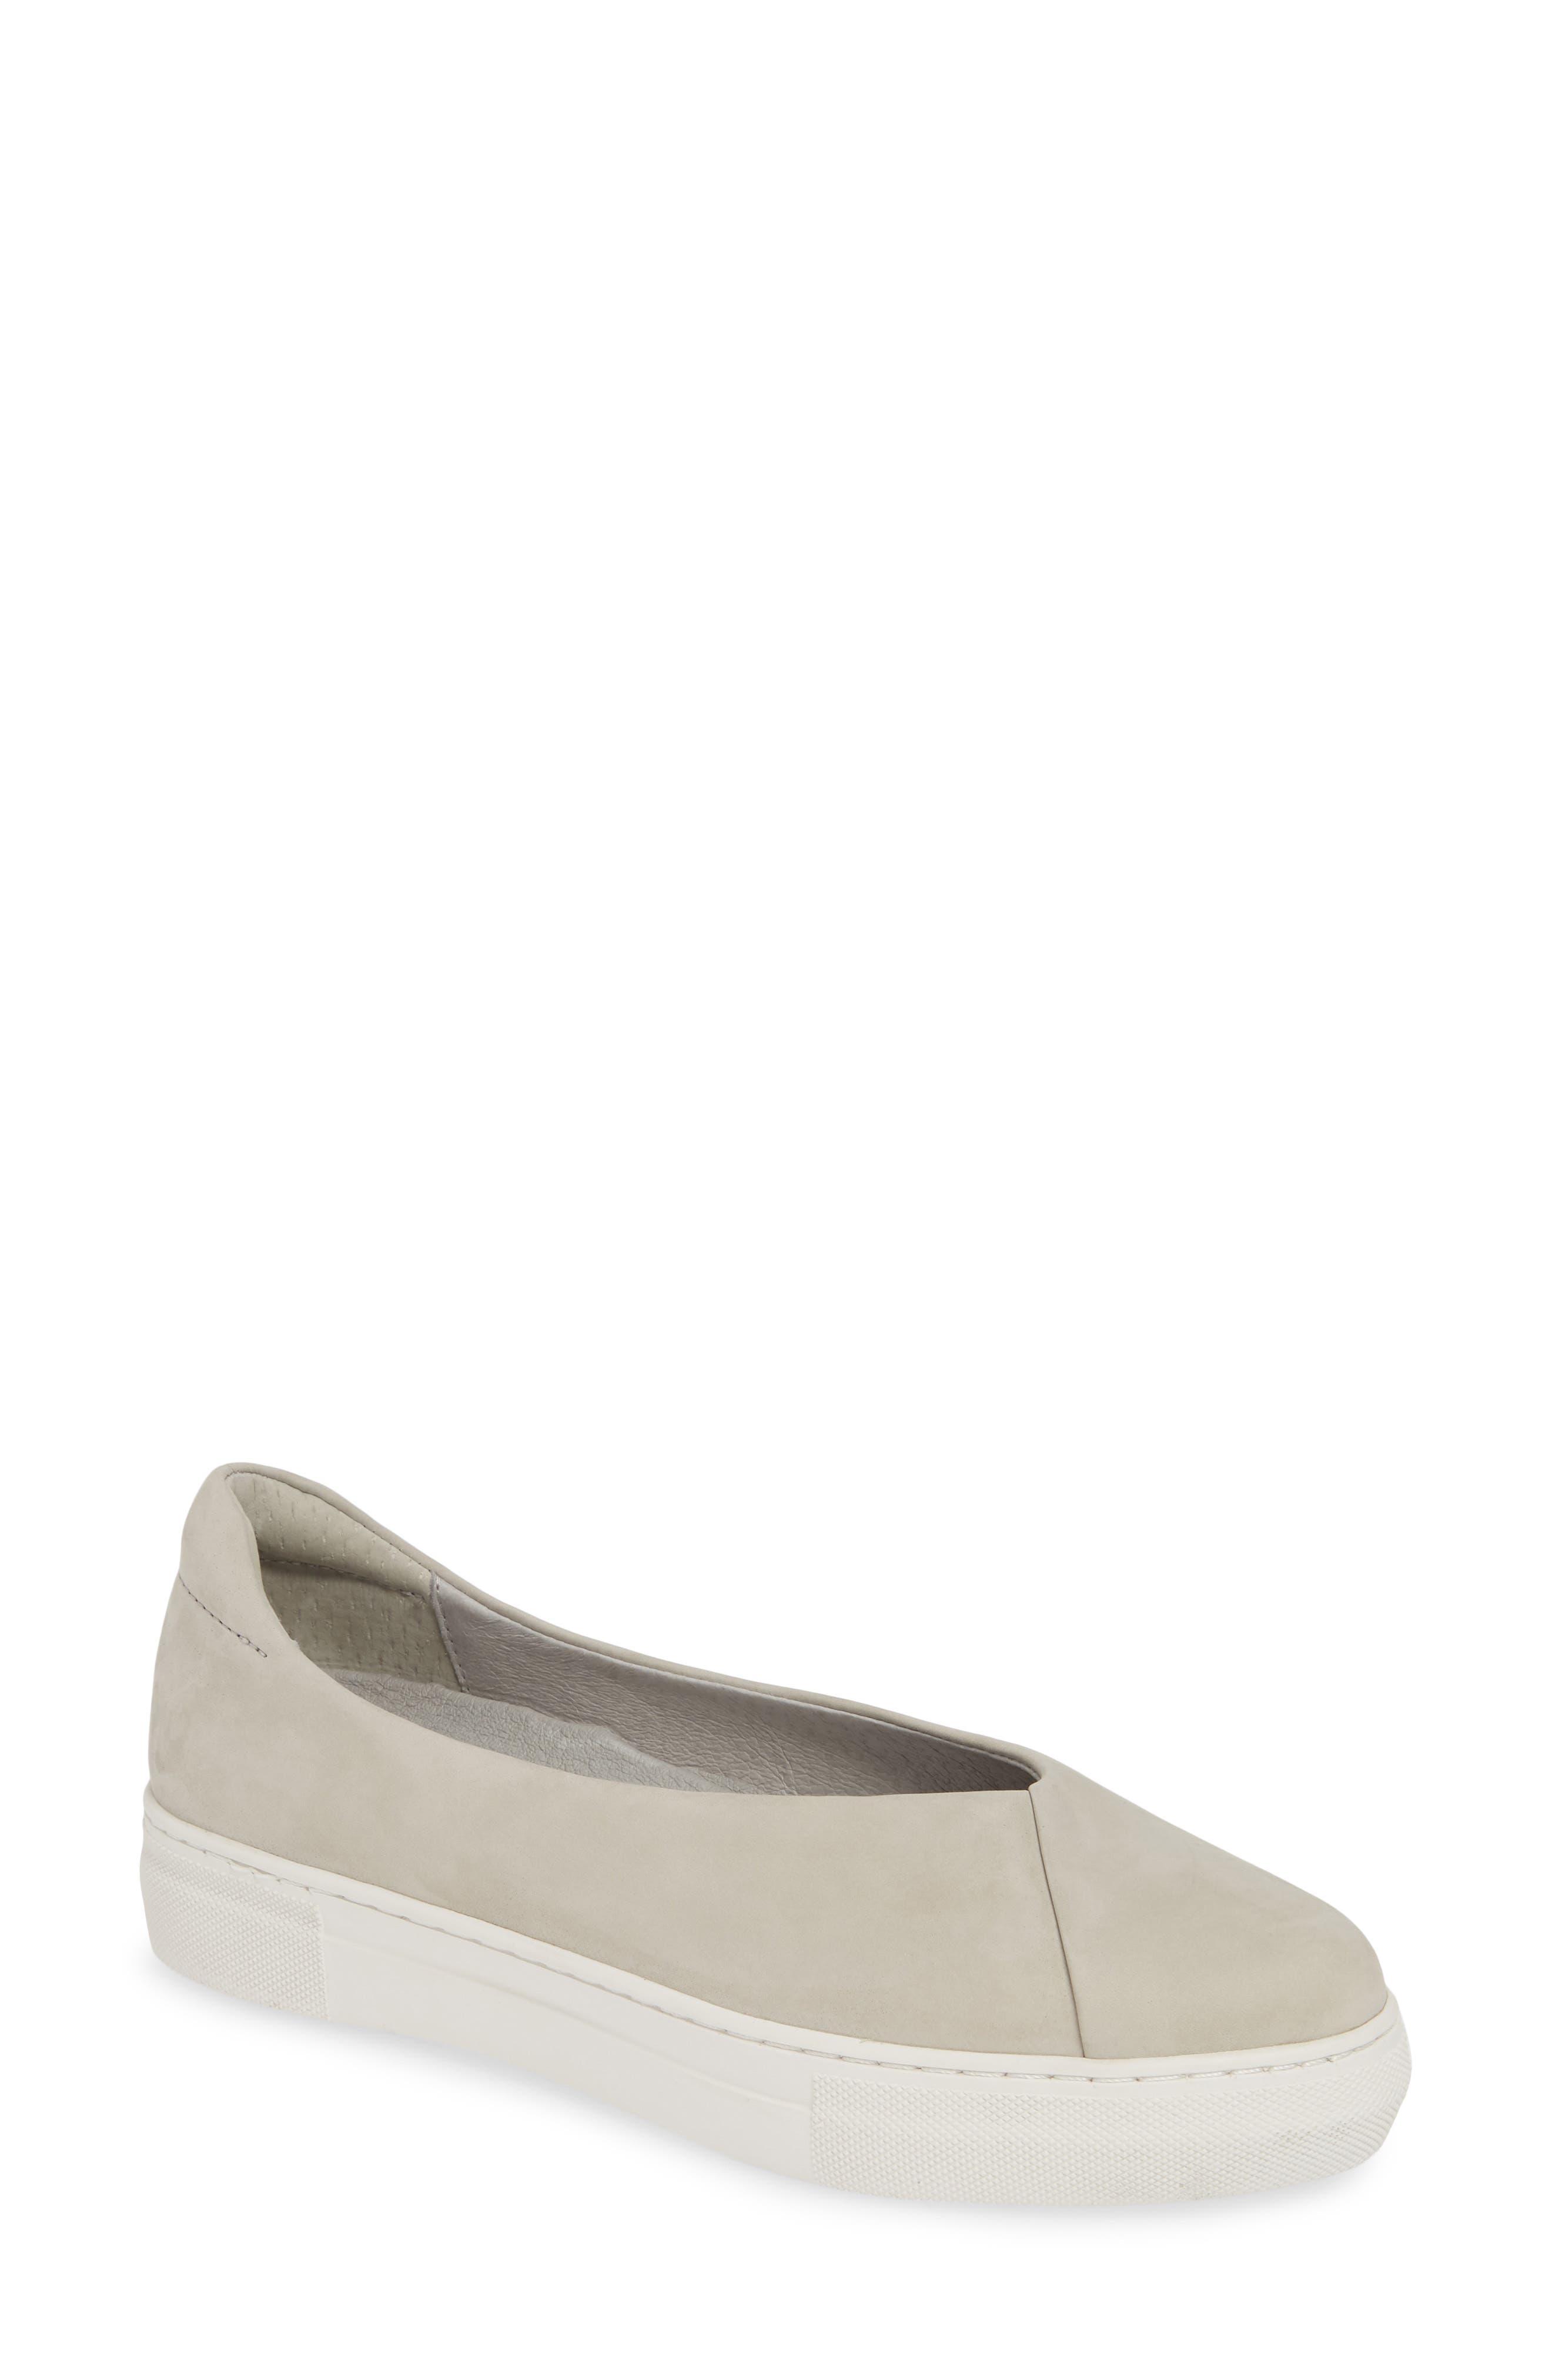 Jslides Felicia Slip-On Sneaker- Grey